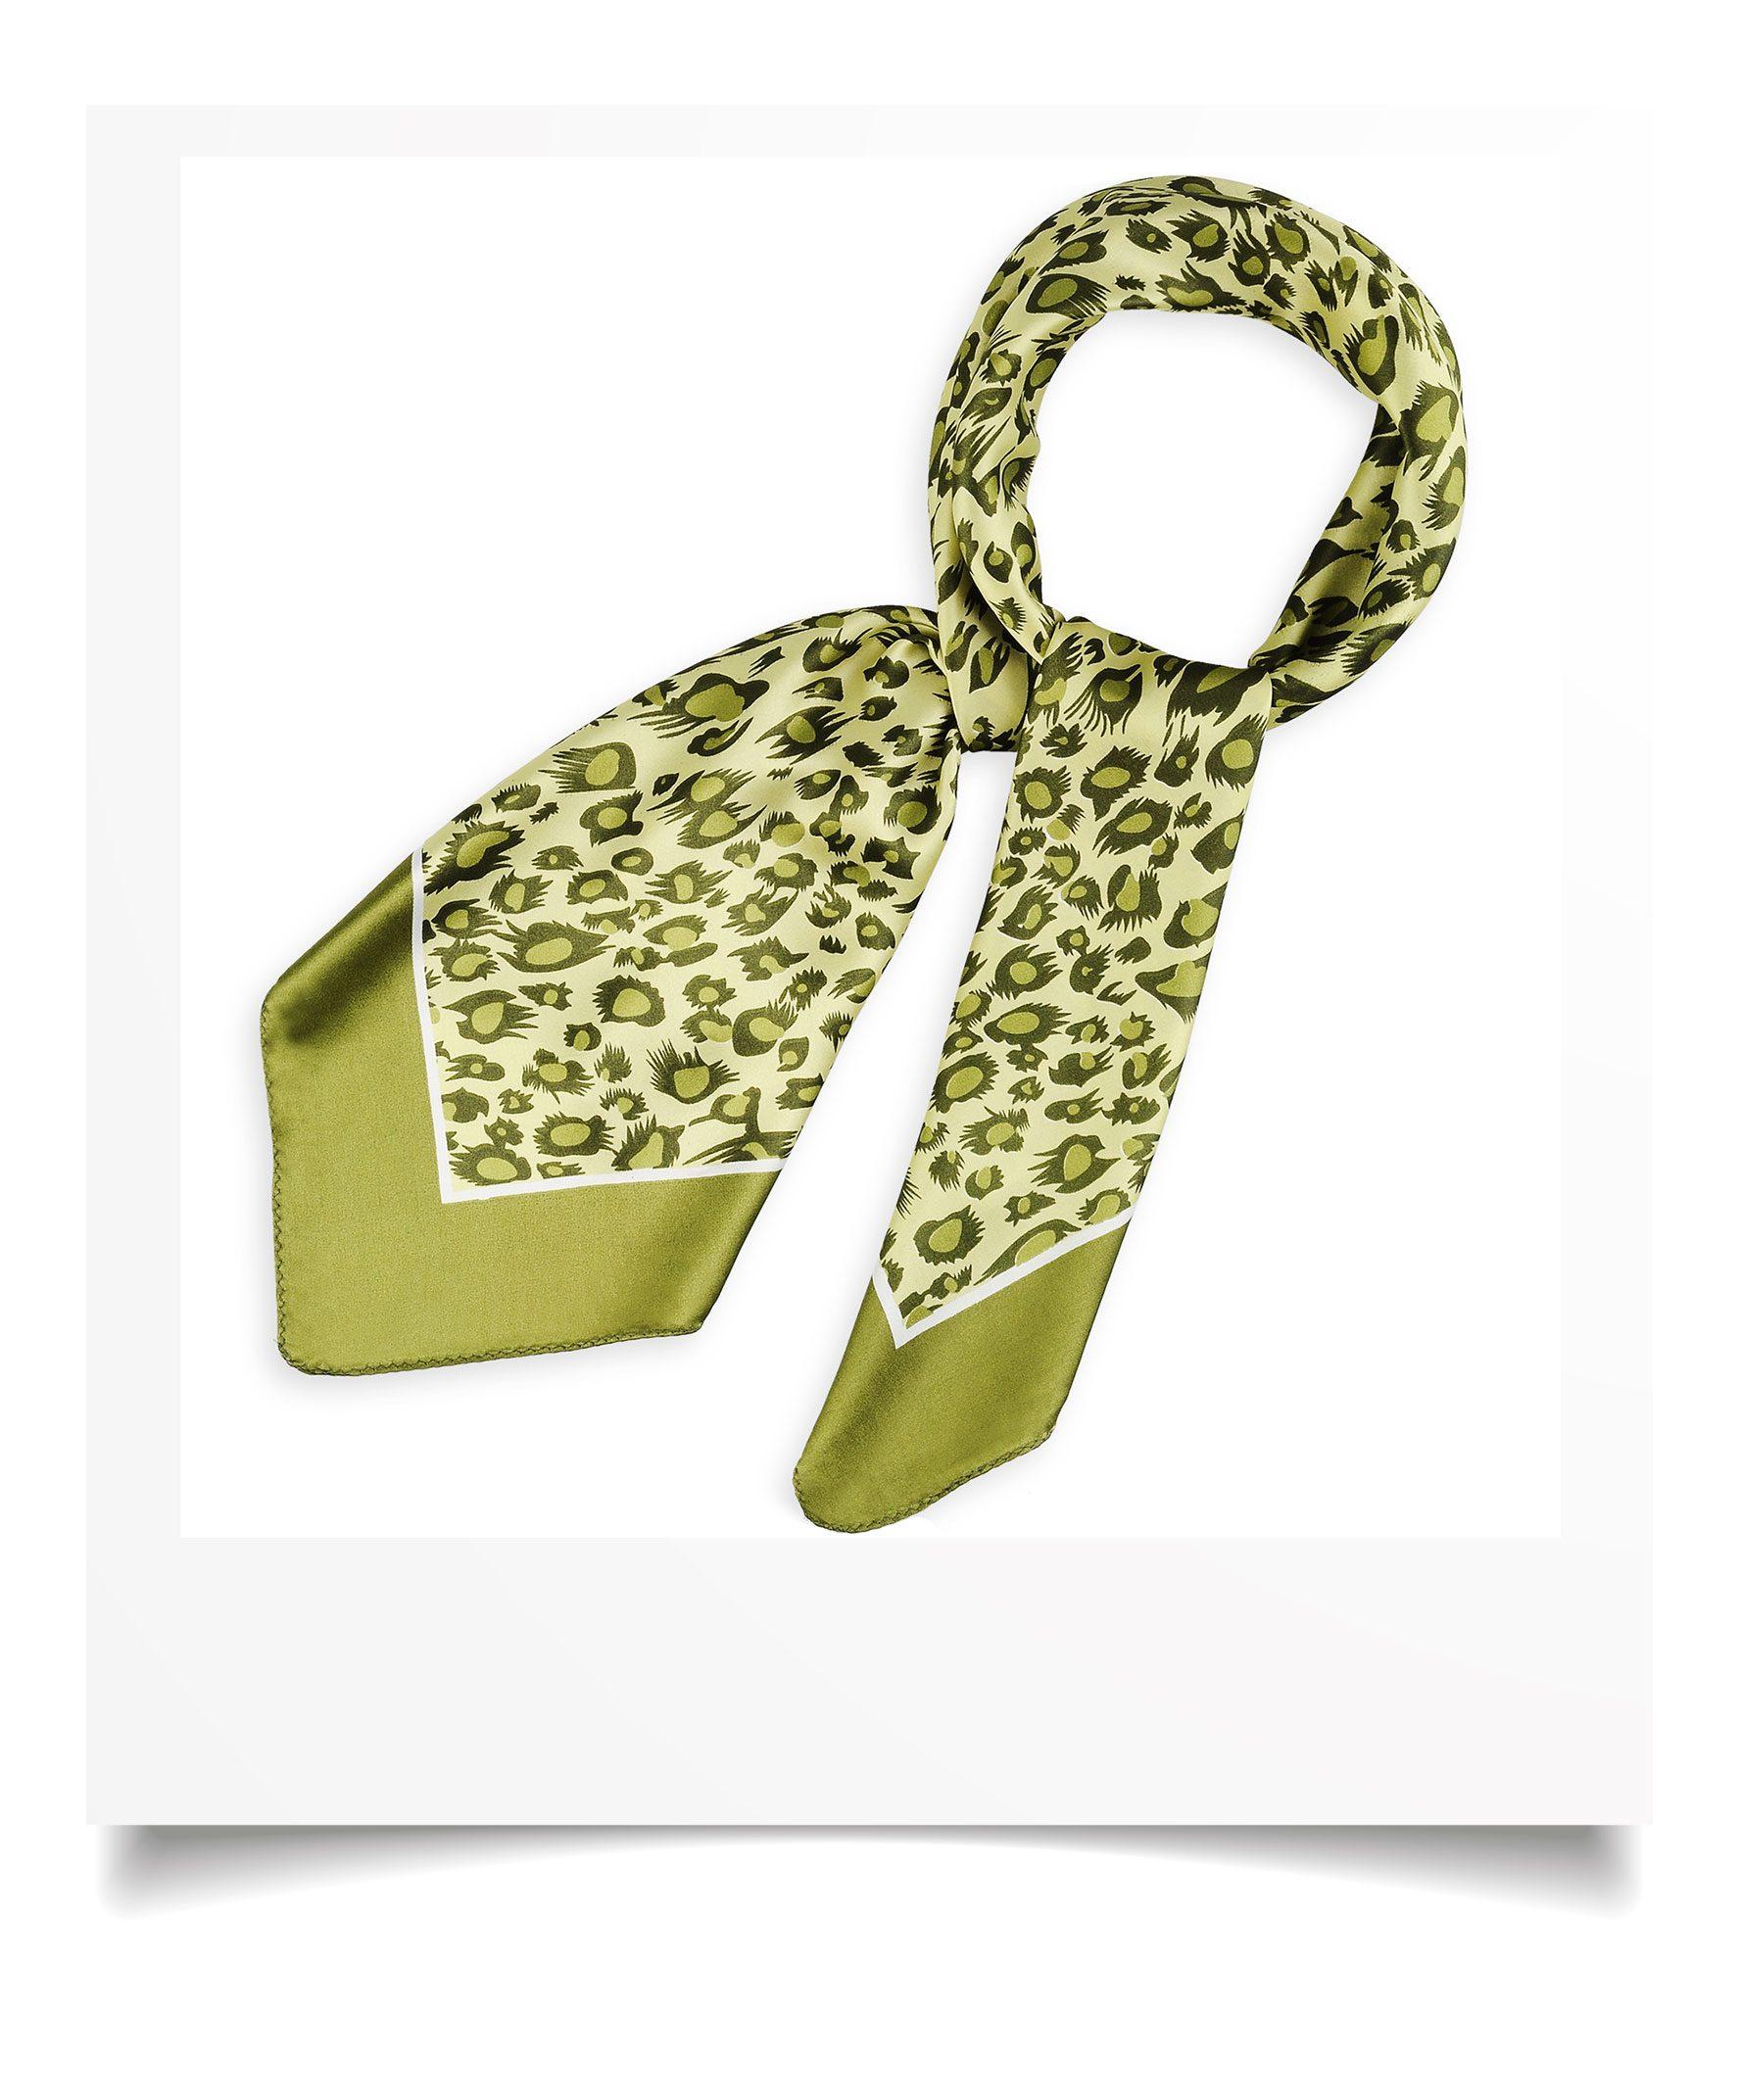 http://lookbook.allee-du-foulard.fr/wp-content/uploads/2018/09/0695-3-ADF-Accessoires-de-mode-LB-Selection_leopard-carre-polysatin-kaki-1776x2144.jpg